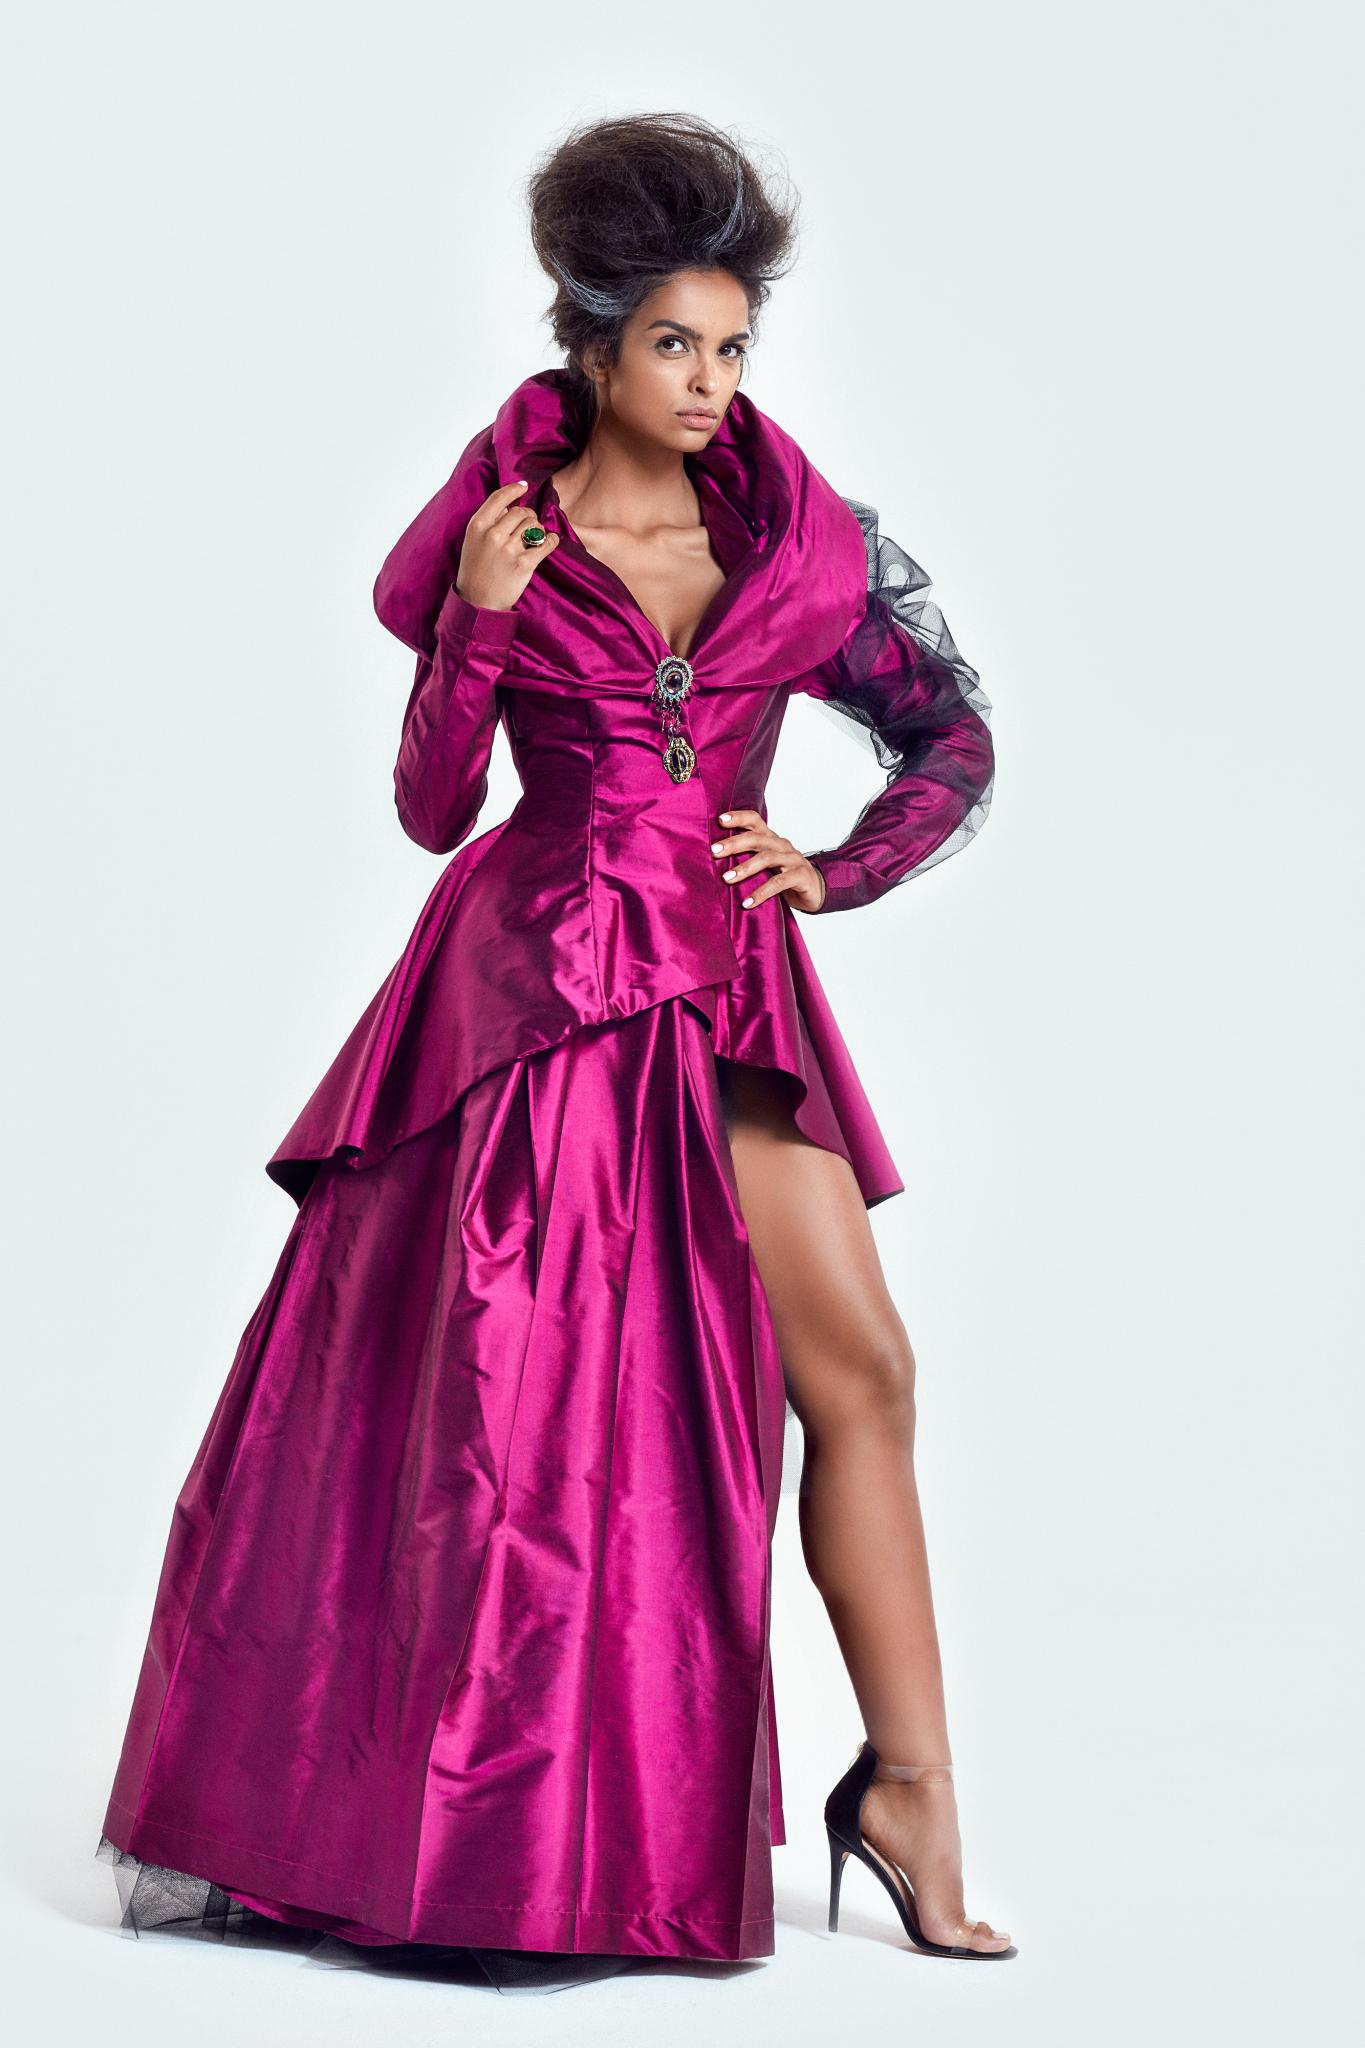 Nagie modele cosplay